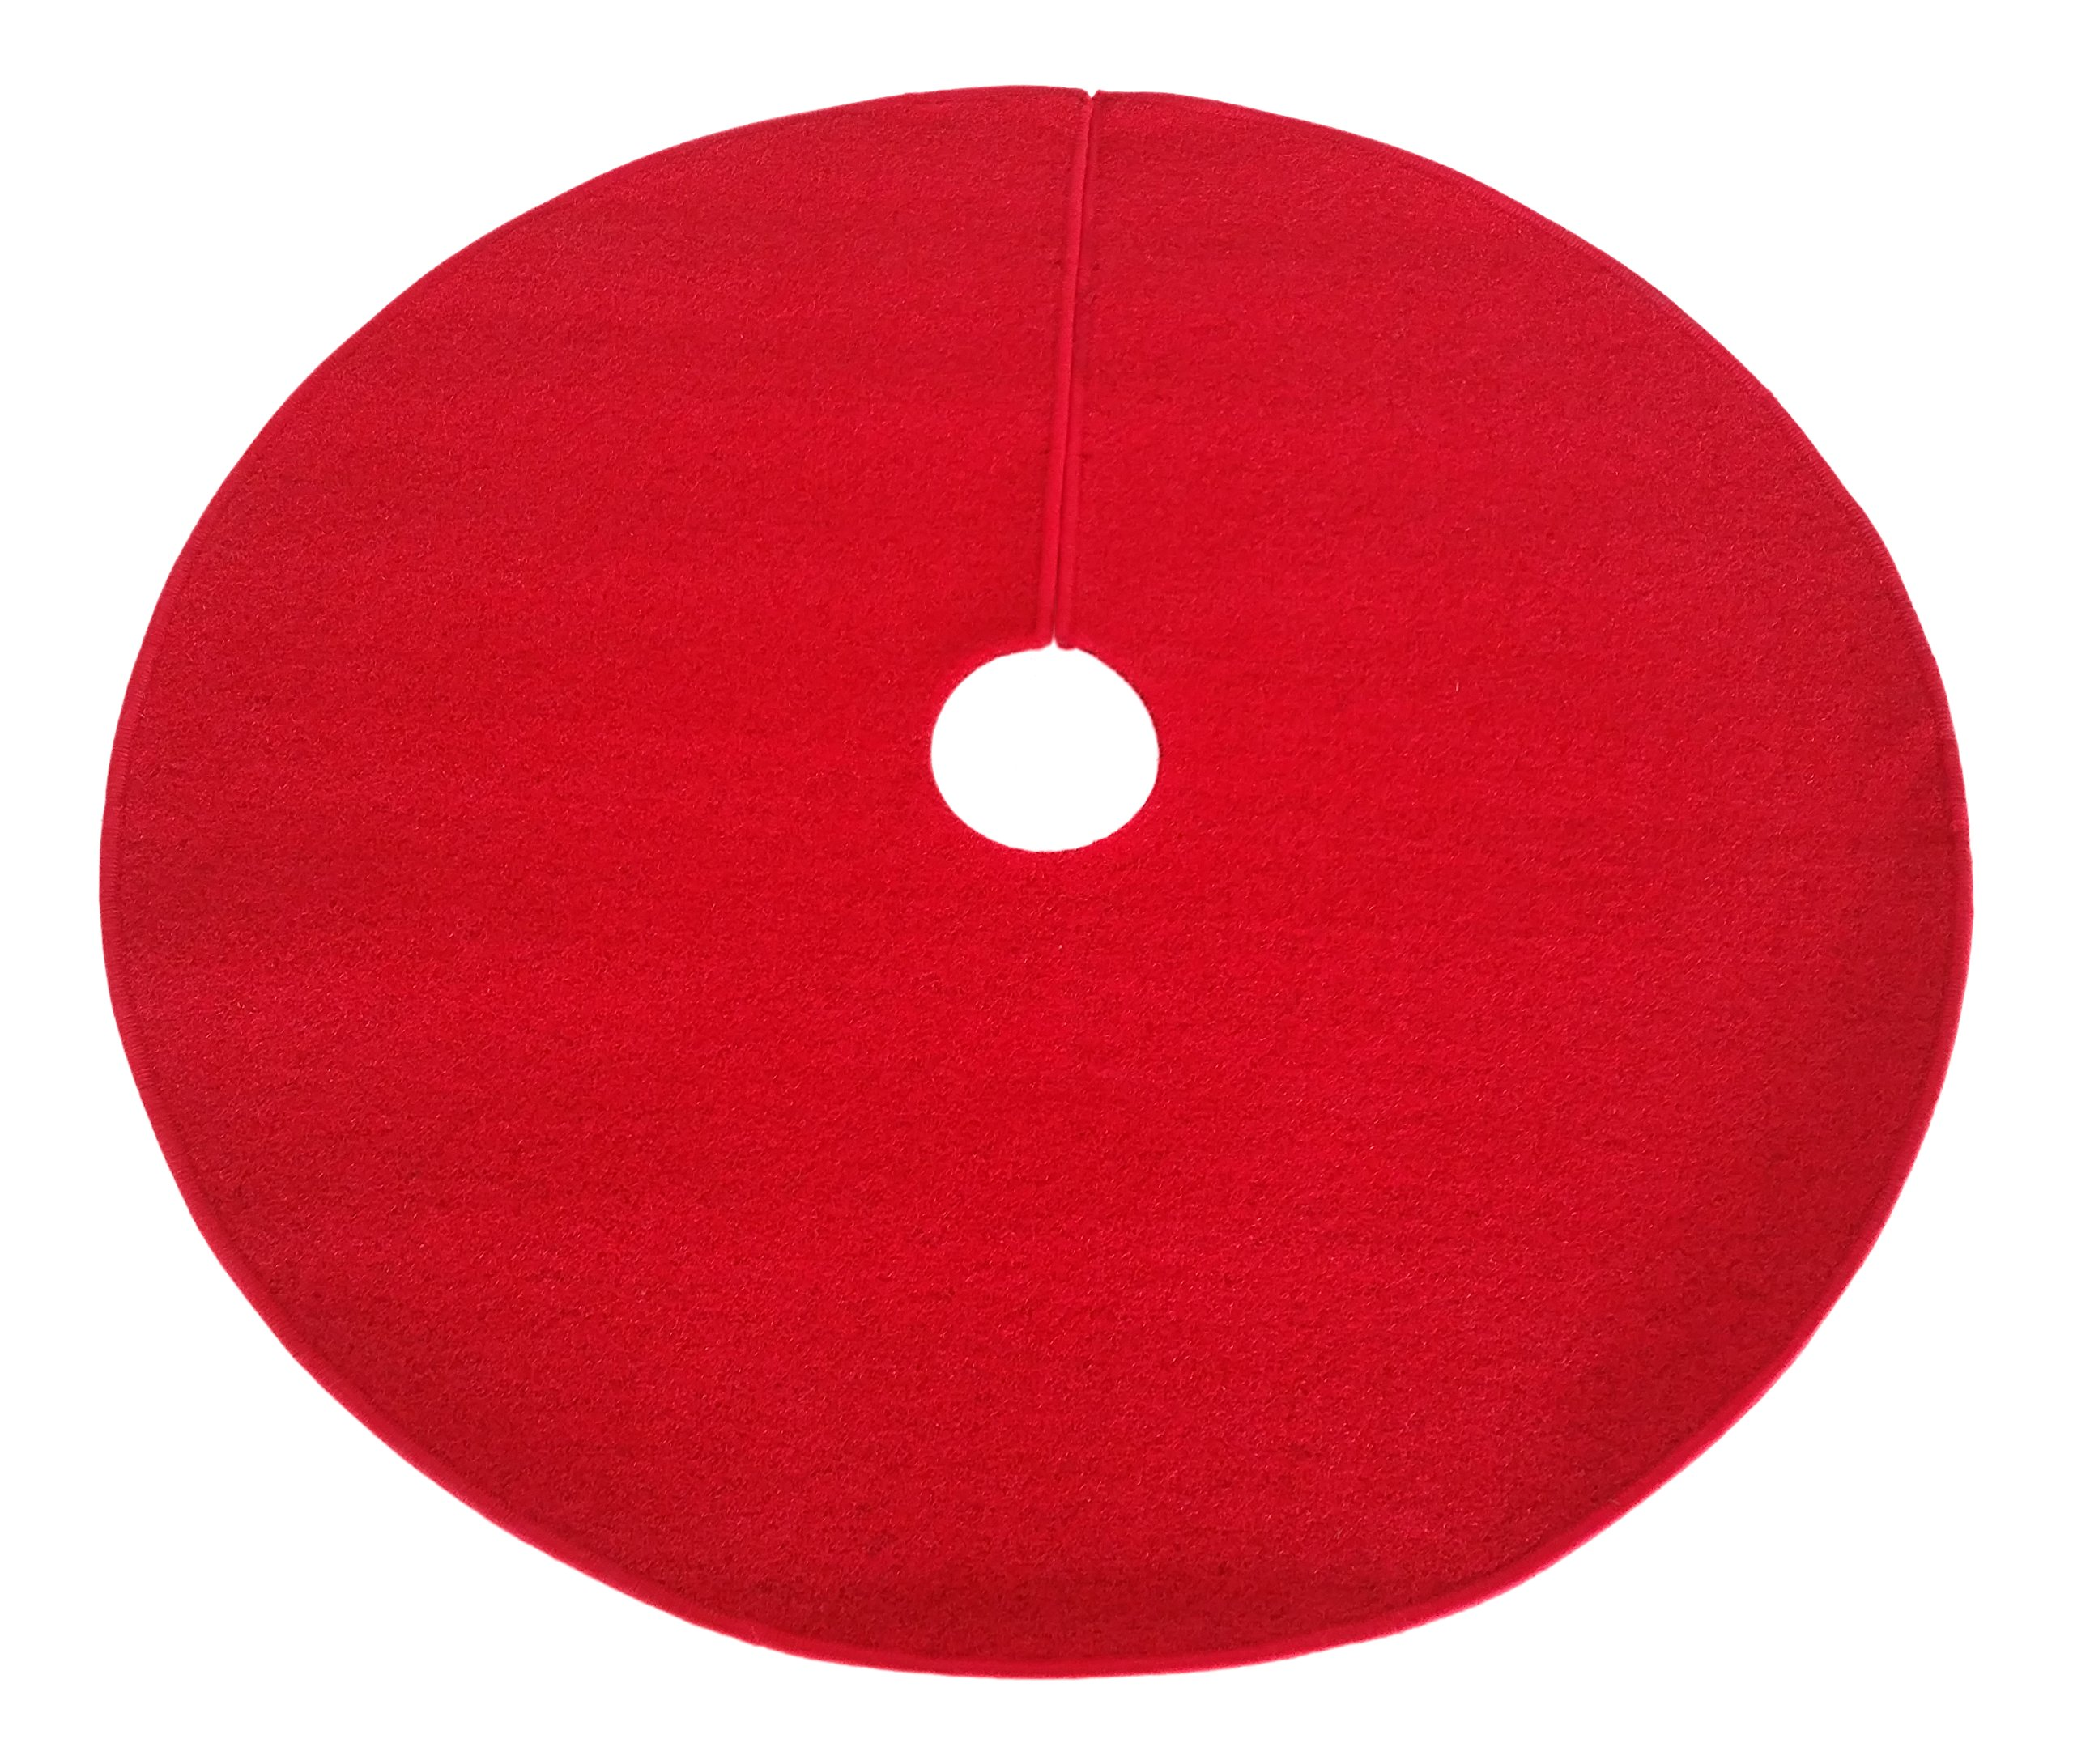 Zen Garden 612409798848 Artificial Grass Christmas Tree Skirt w/Anti-Slip Rubber Base (36'' Diameter) (Red)